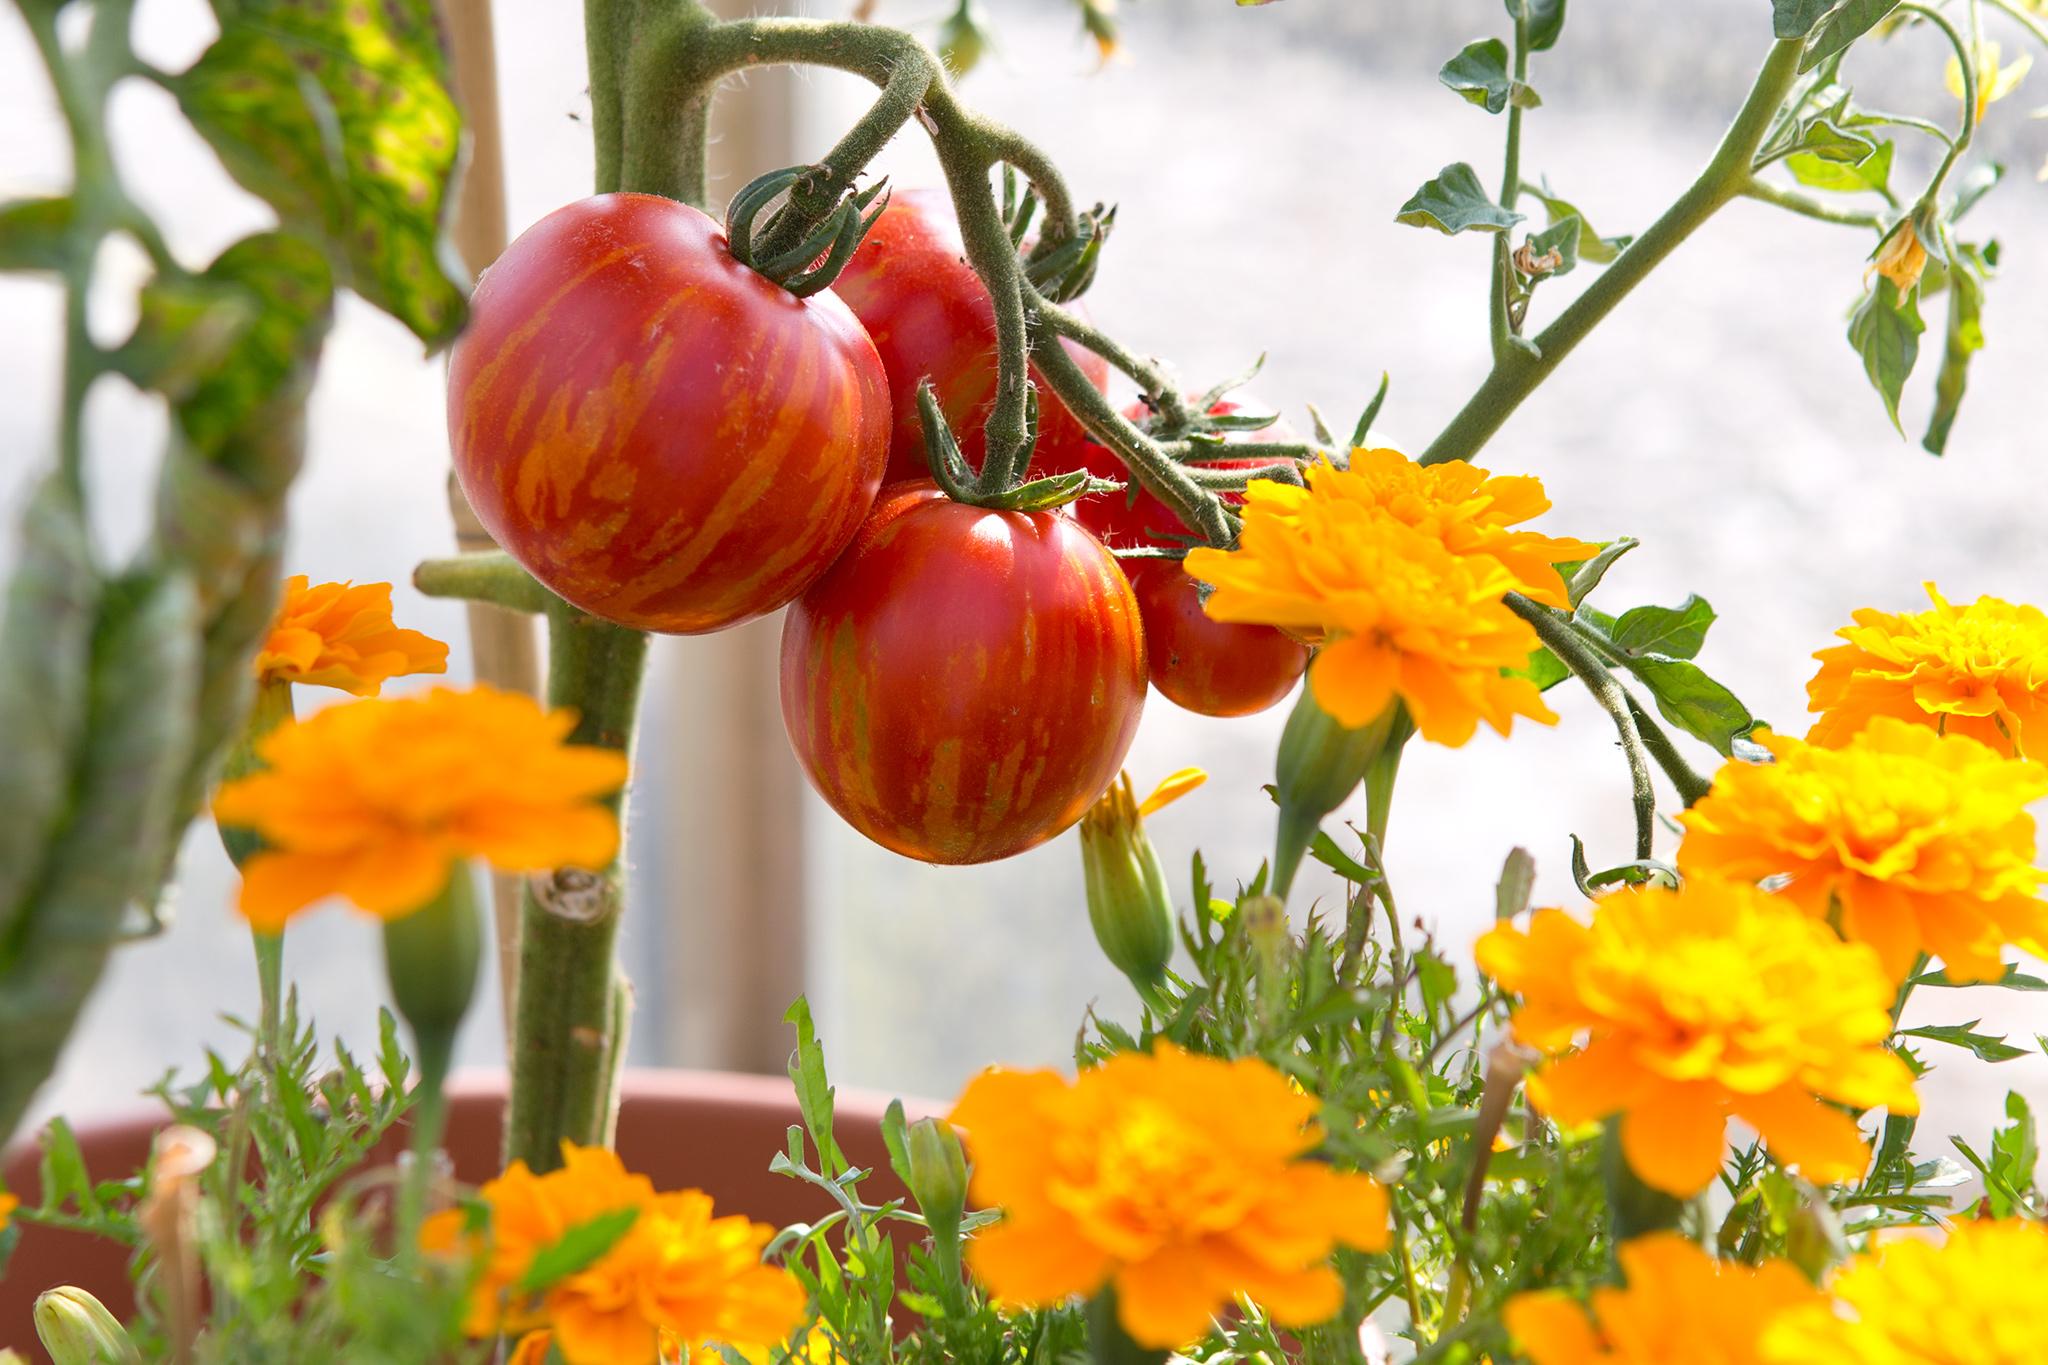 Companion planting combinations